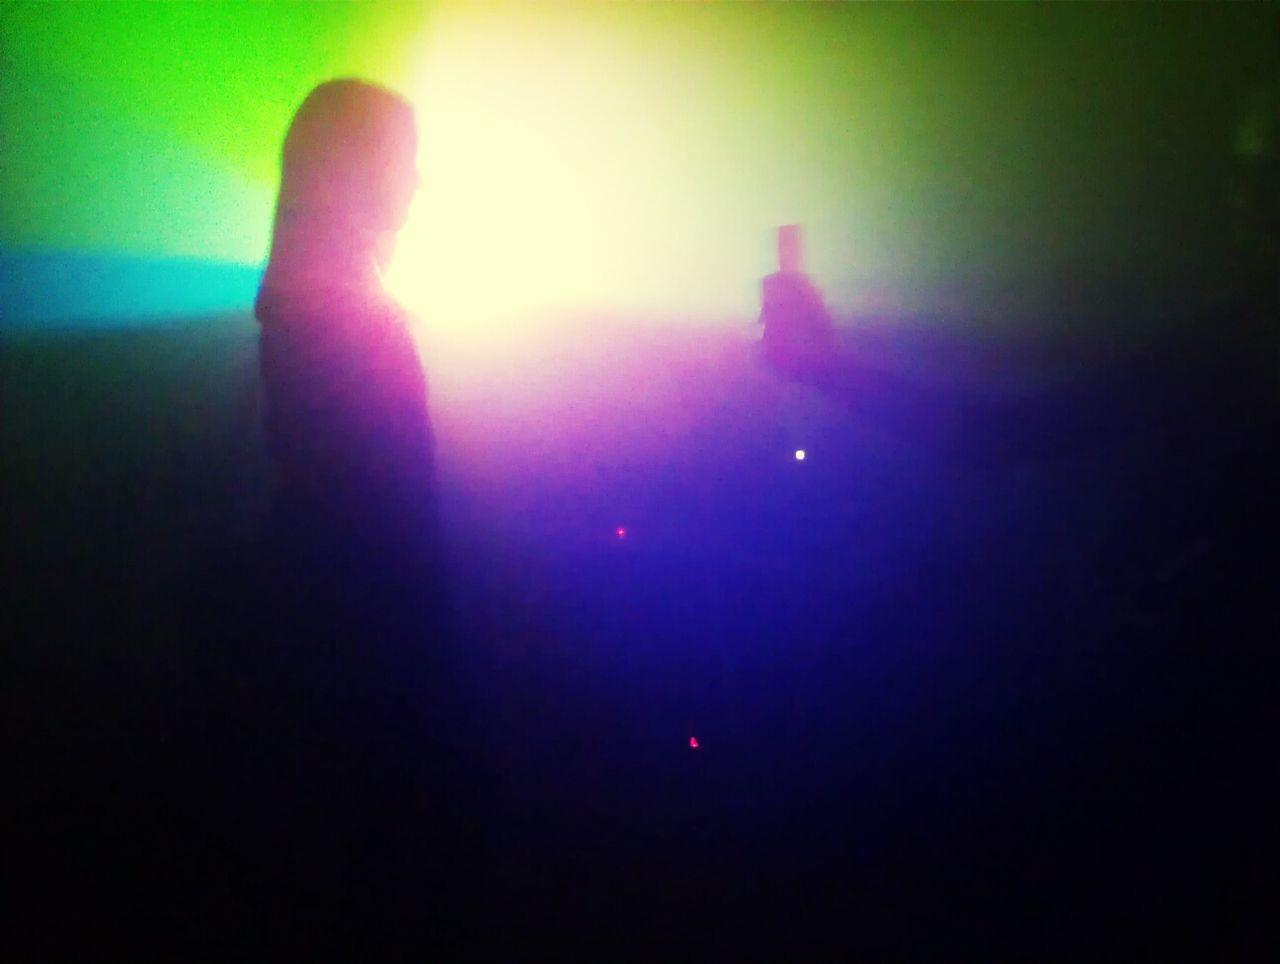 Defocused image of young women dancing at nightclub